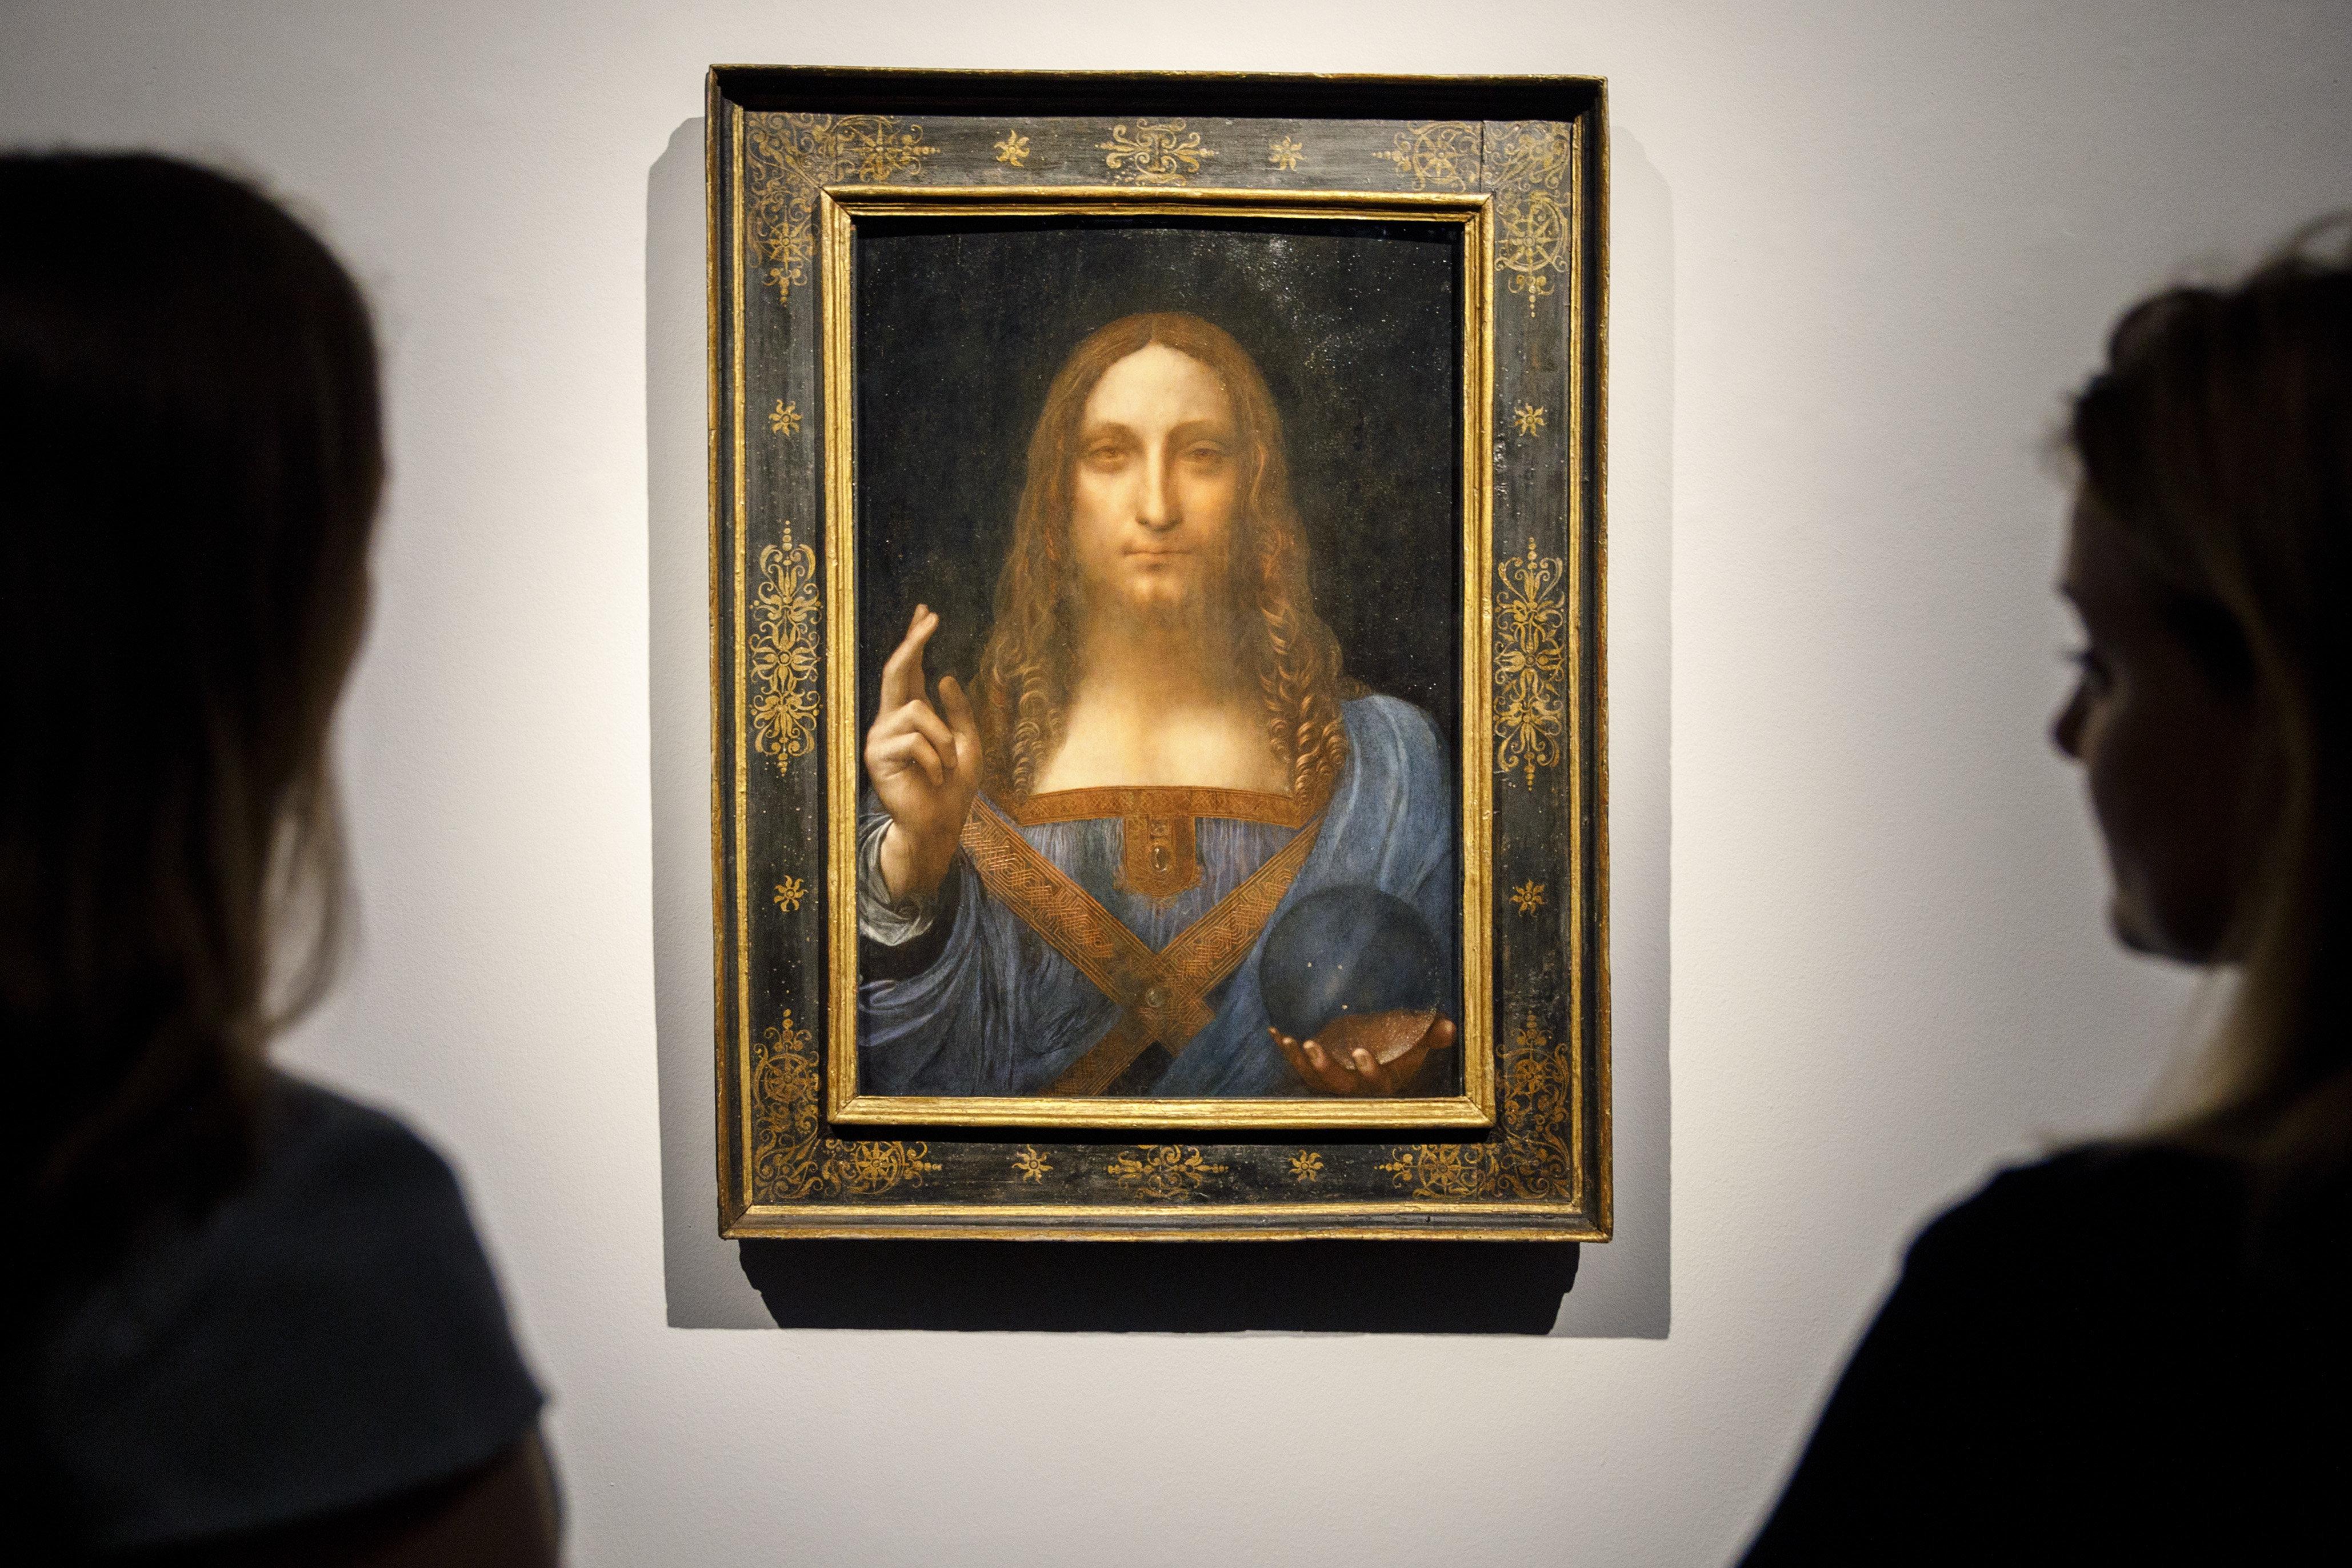 """Salvator Mundi"" is a portrait of Christ that's been attributed to Leonardo da Vinci circa 1500."